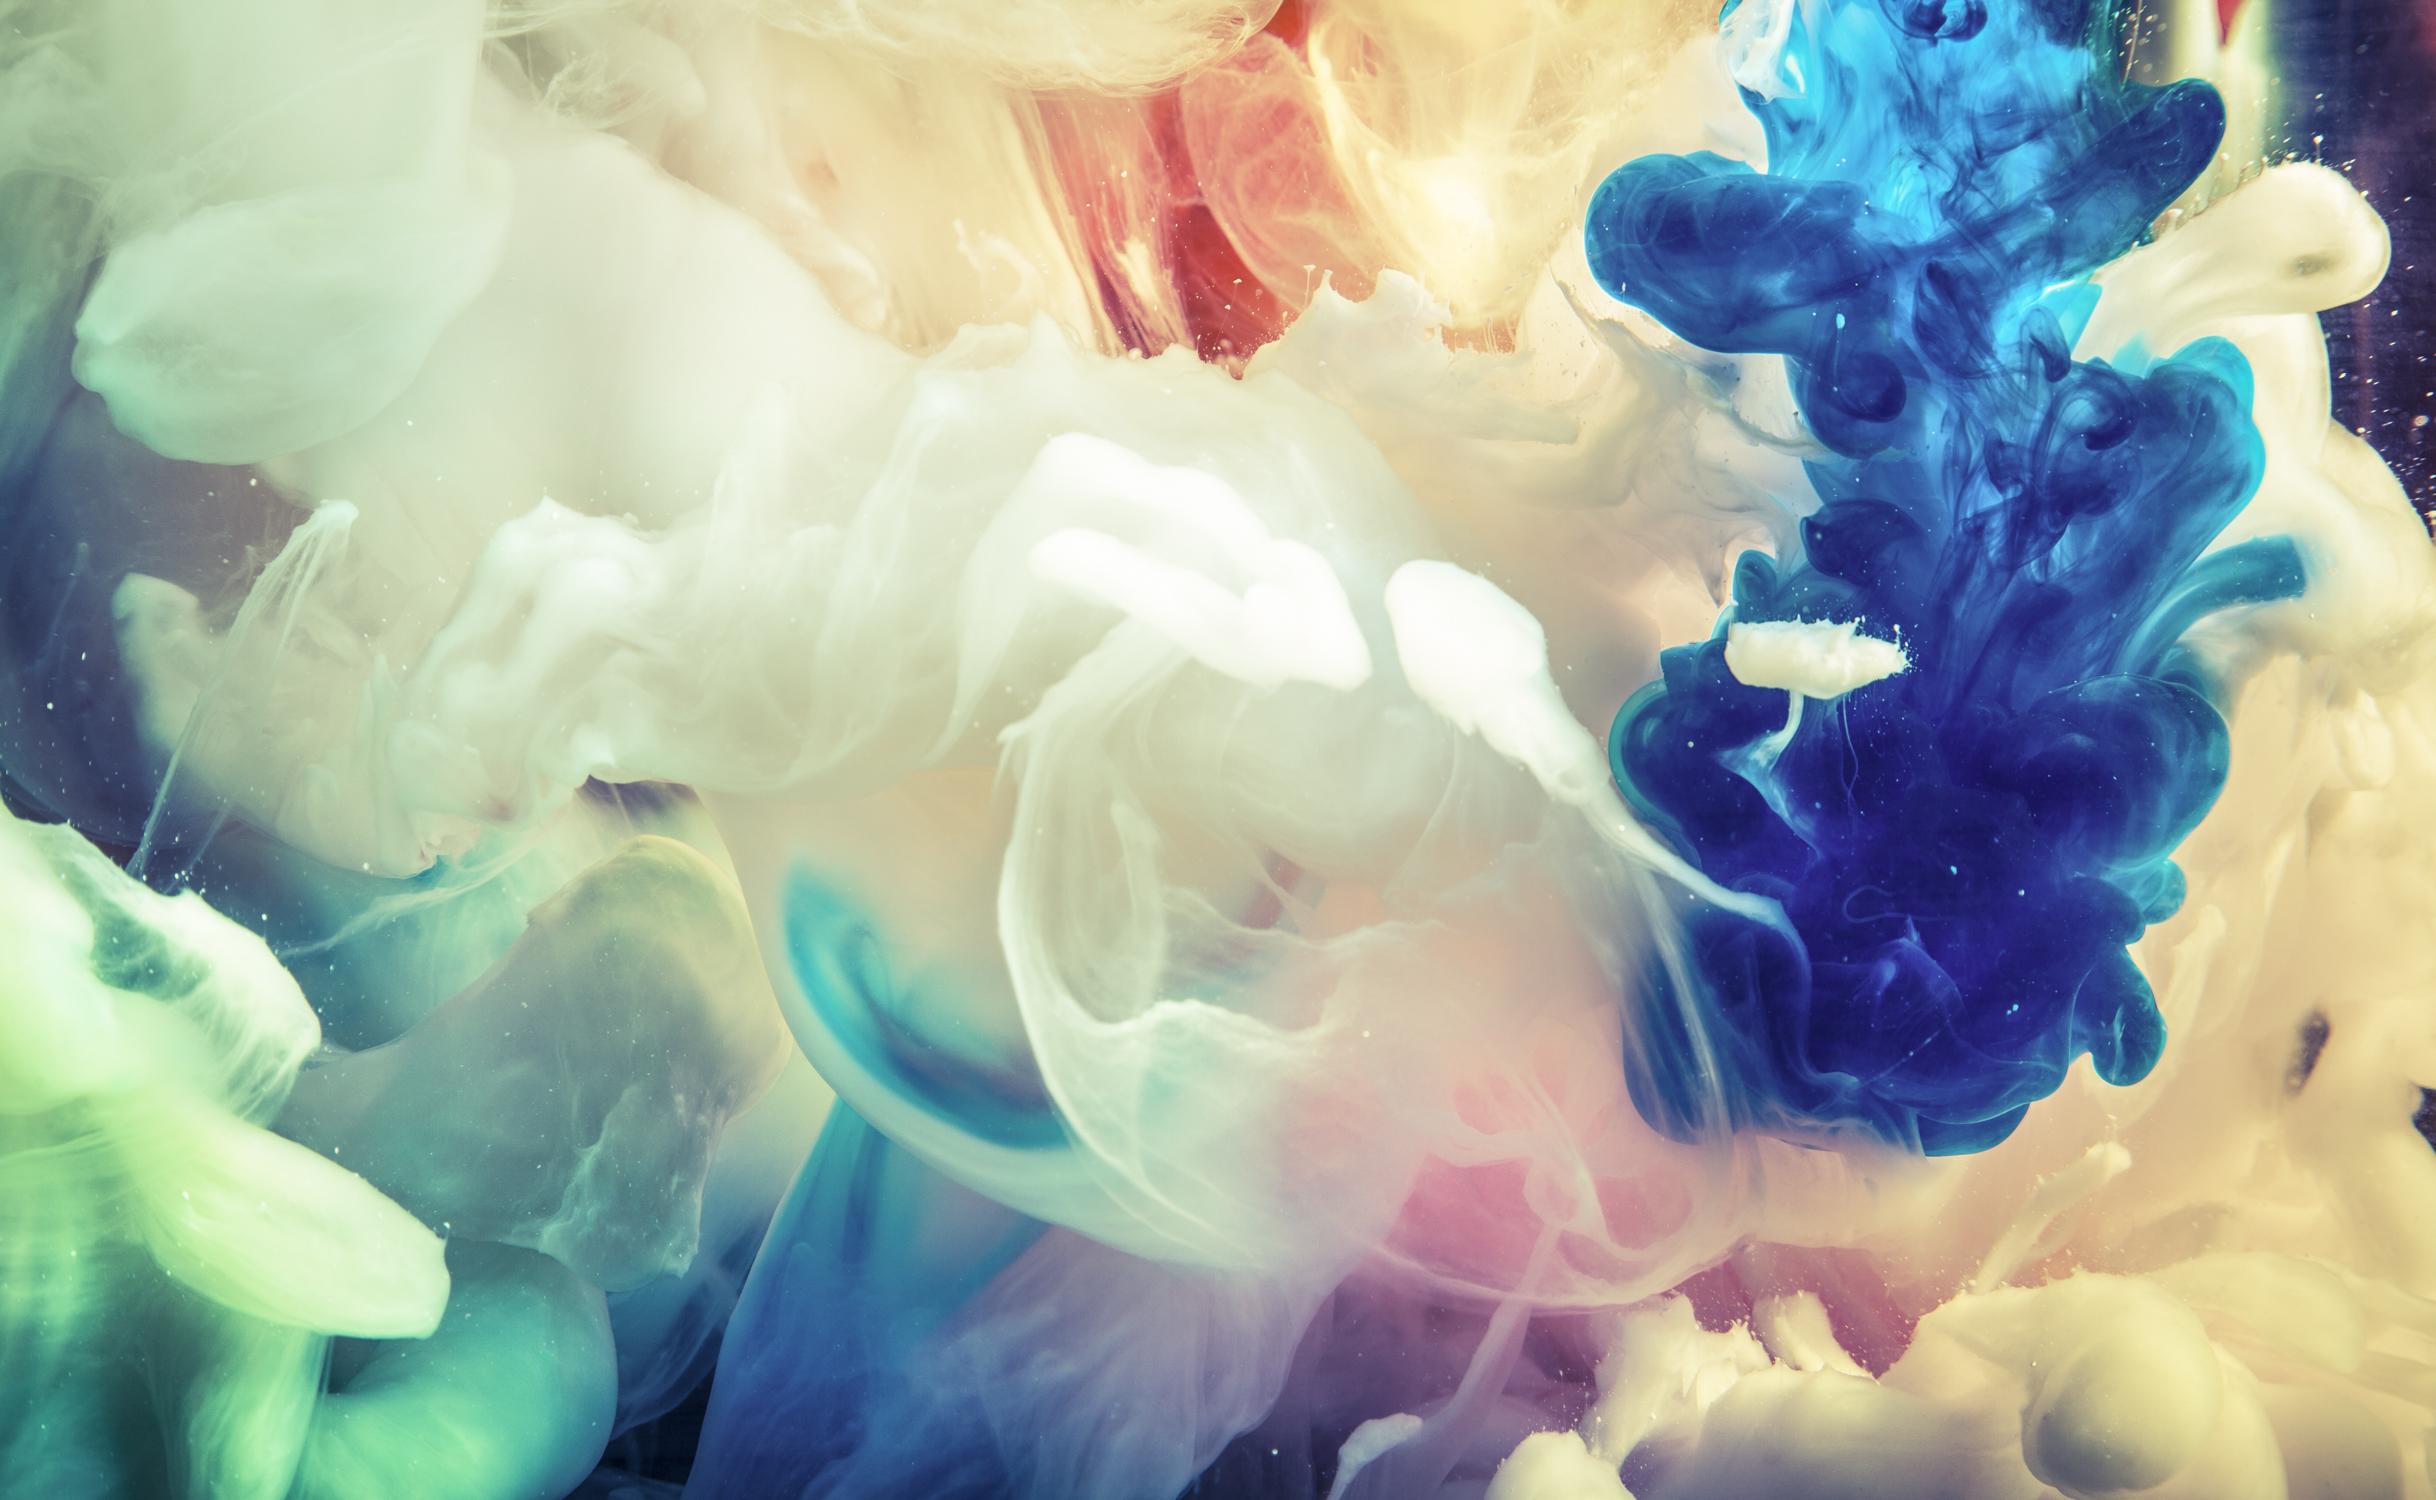 Cloud 9 #2 of 15